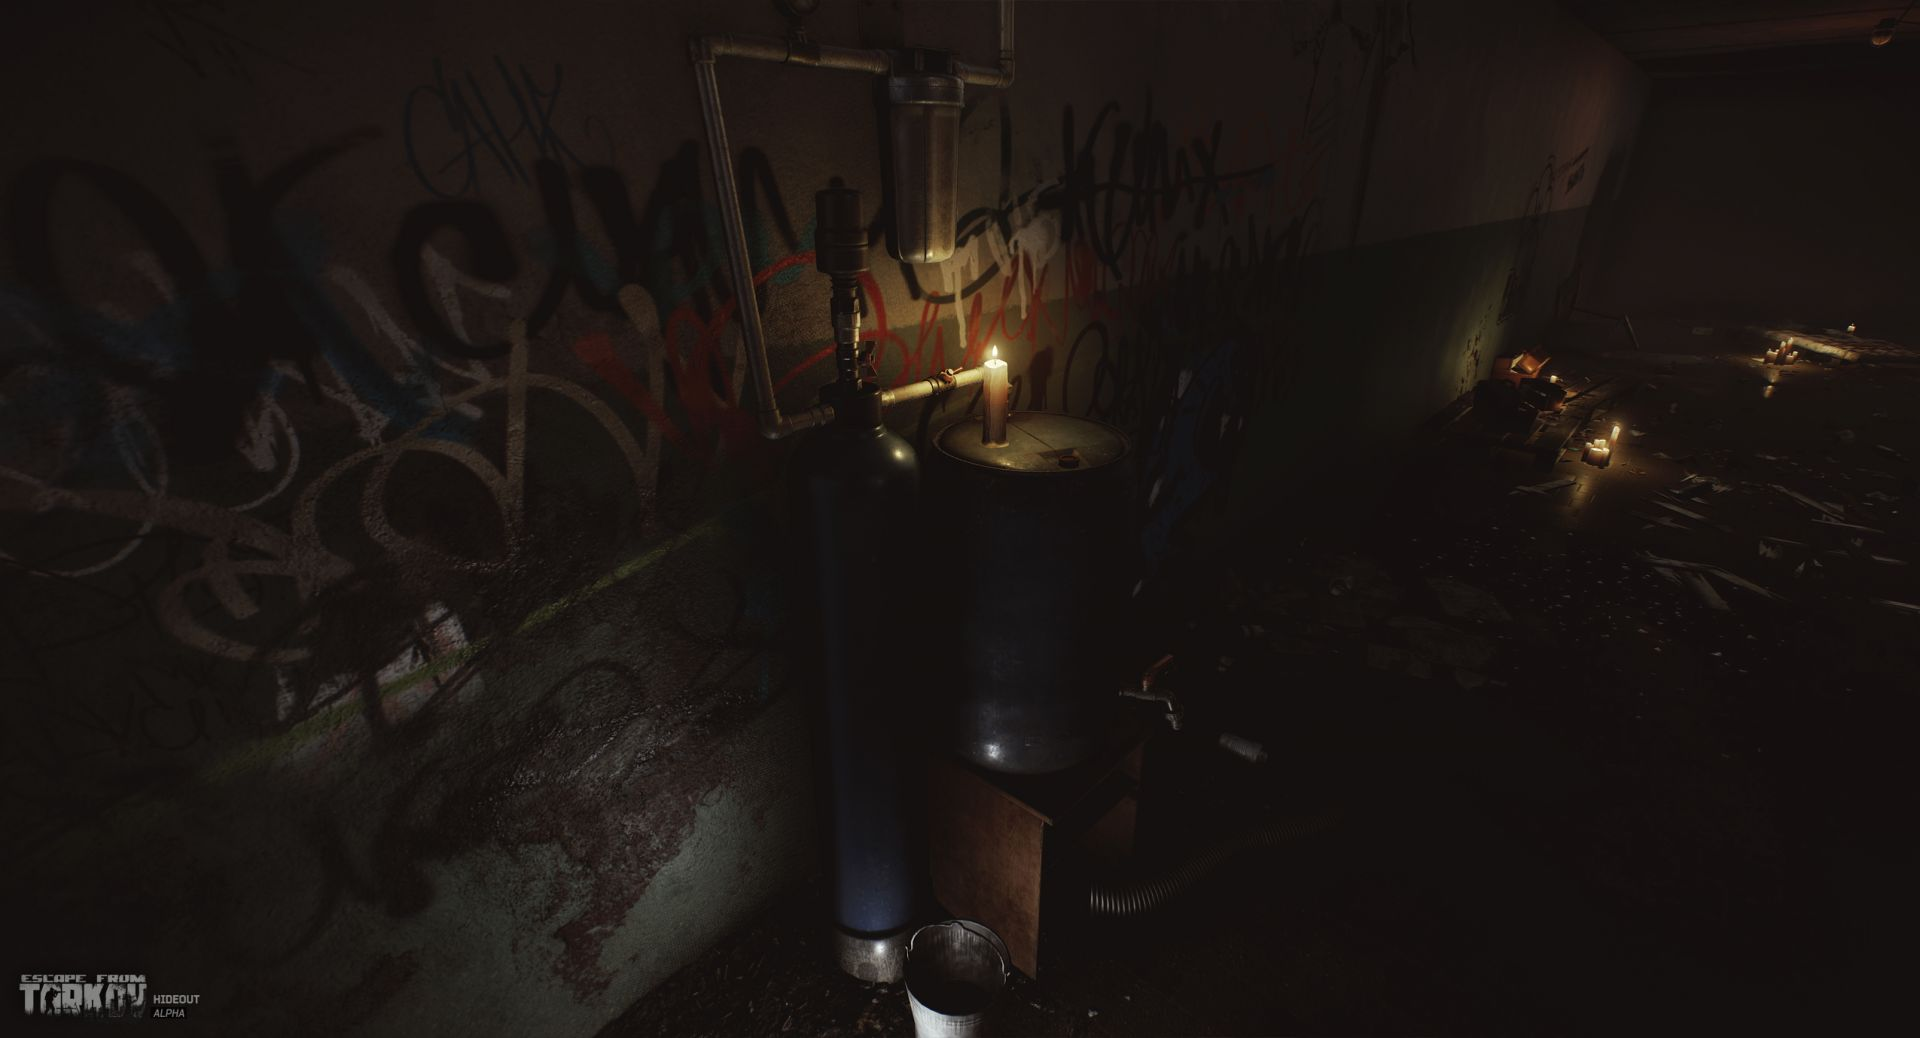 escapefromtarkov_hideout8